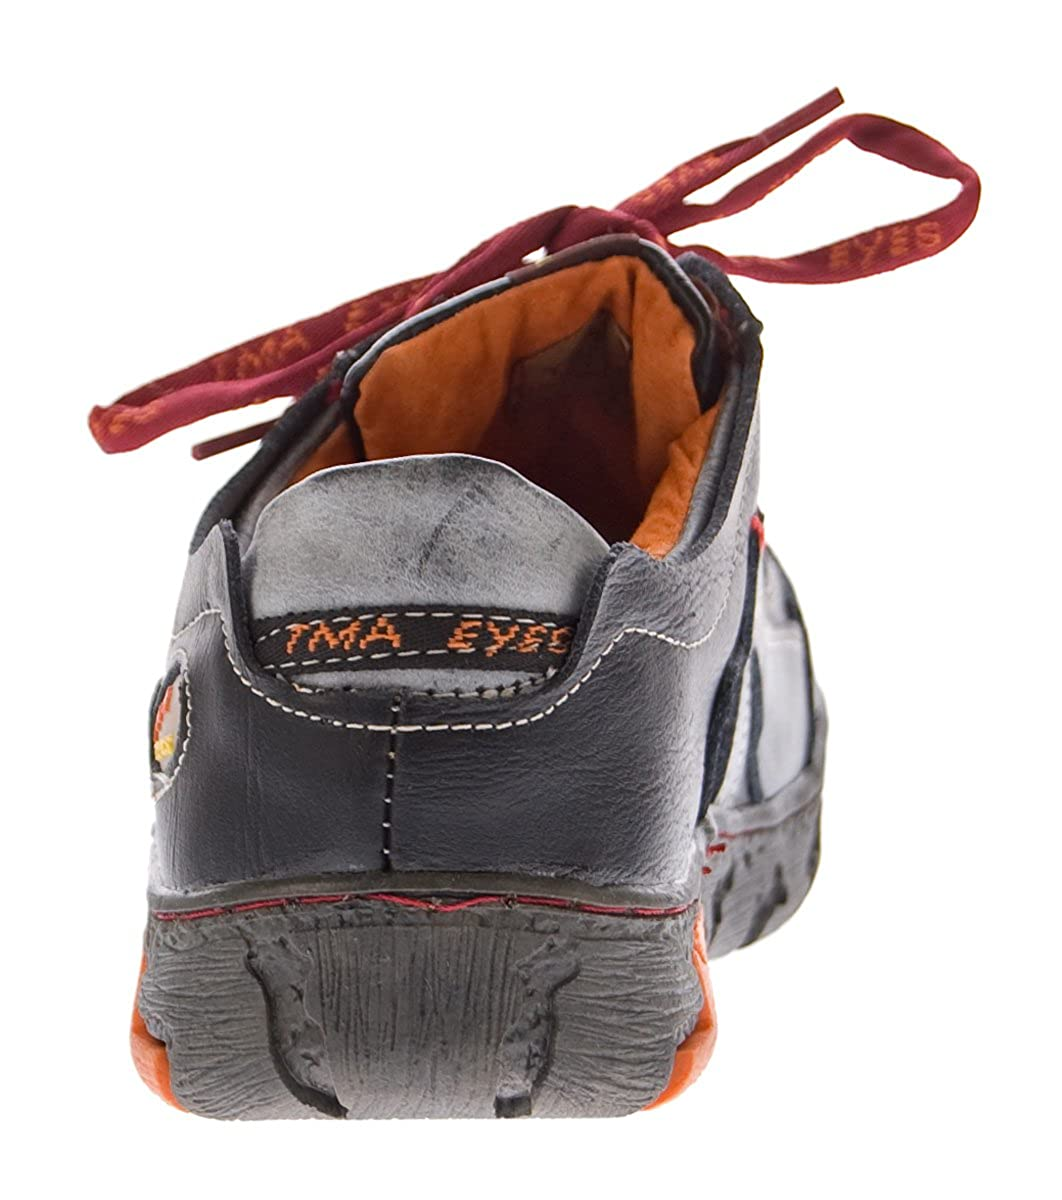 Comfort Damen Grün Sneakers Leder Schuhe Schwarz Grün Damen Weiß Gelb Turnschuhe Schnürer Halbschuhe Schwarz 2a12fa